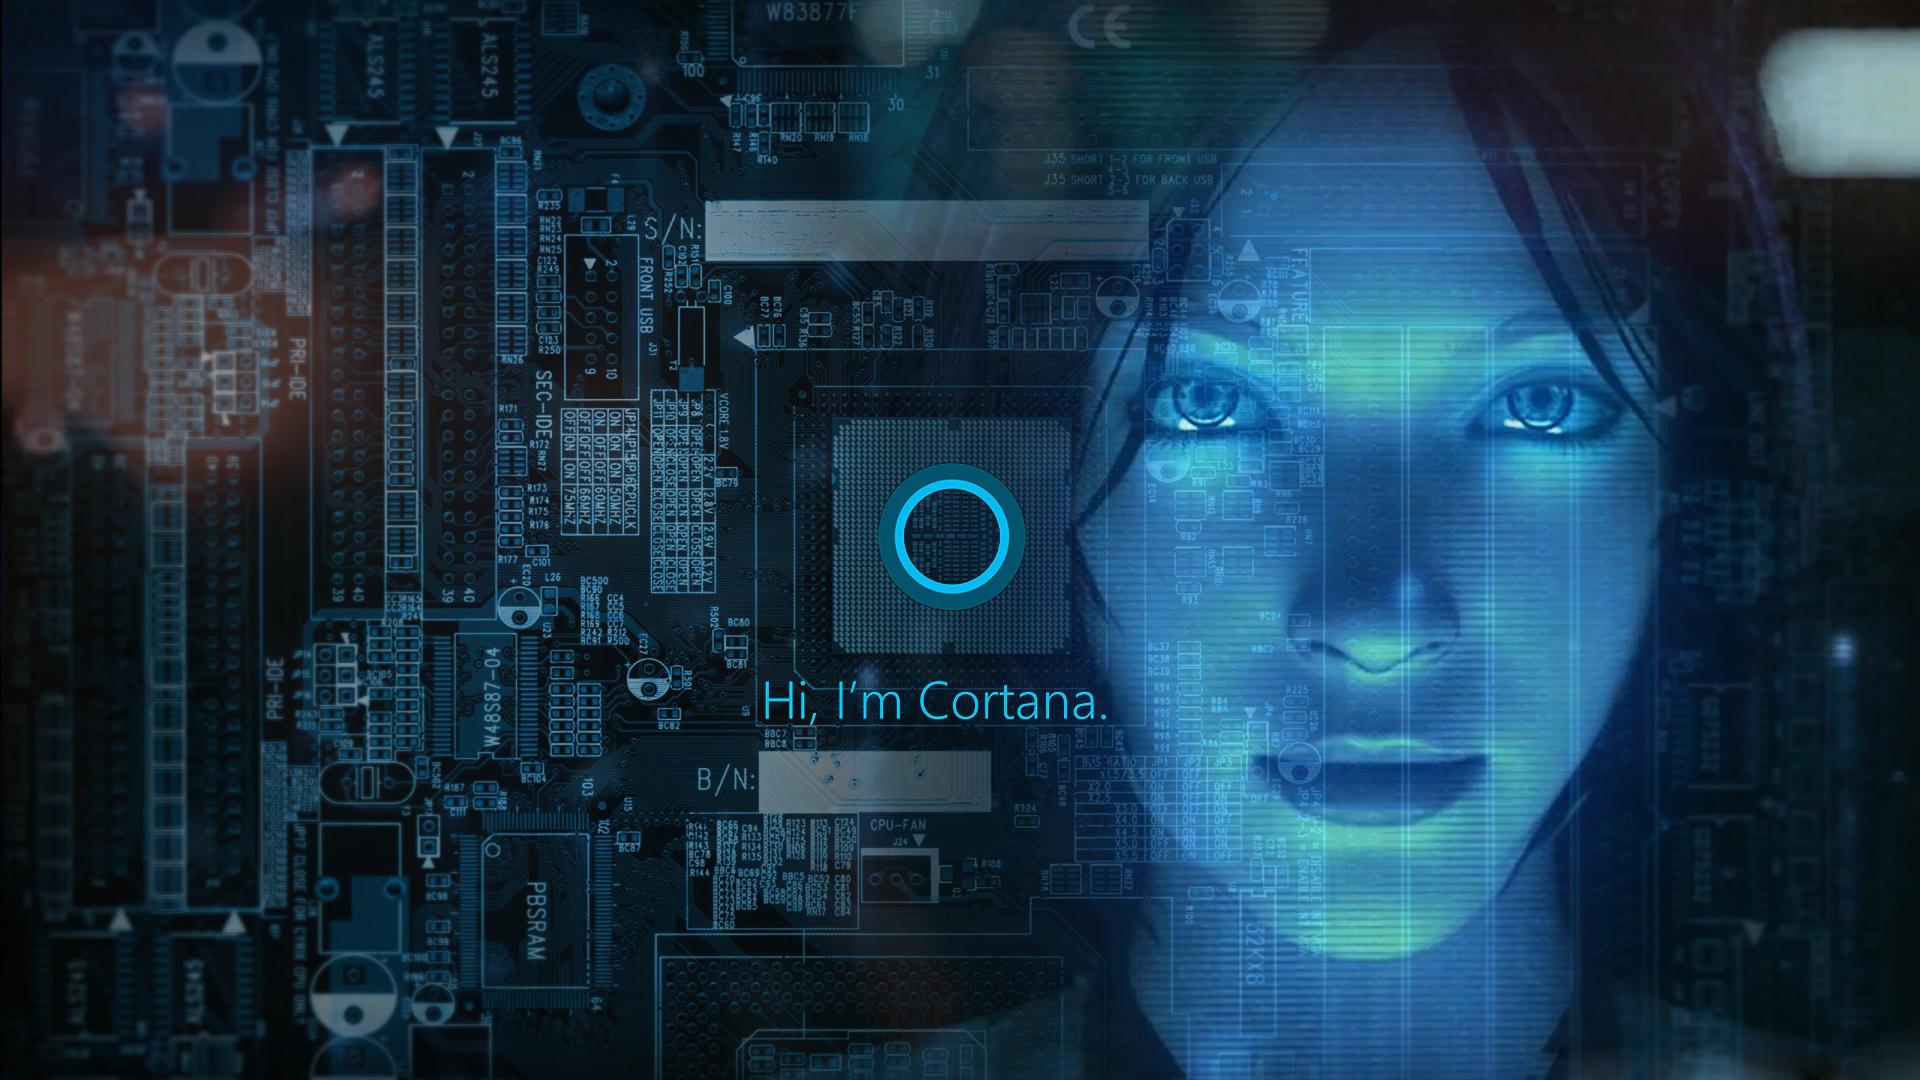 41 Cortana Animated Wallpaper Windows 10 On Wallpapersafari